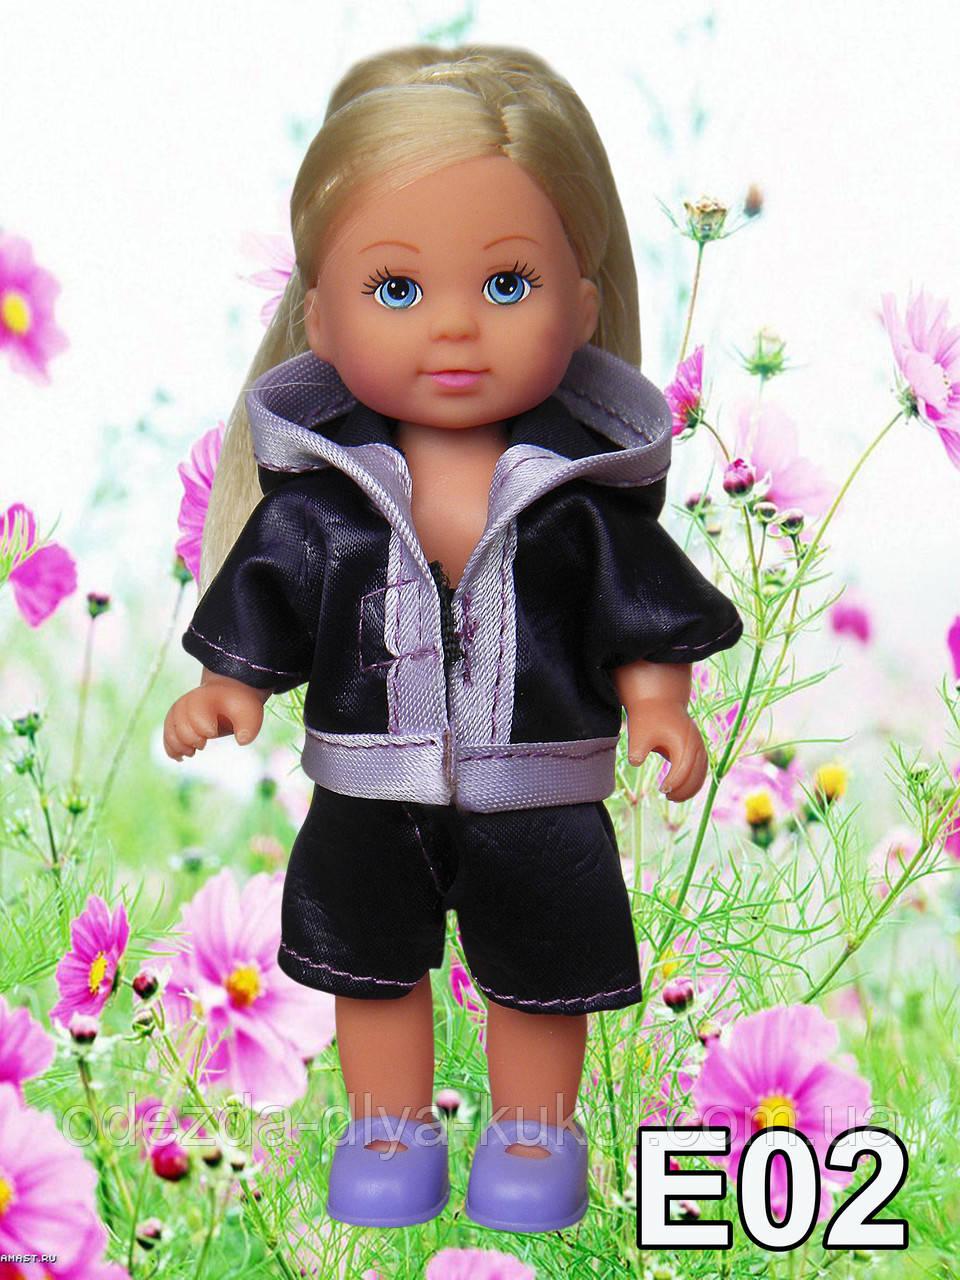 Кофточка и шорты для кукол Симба Еви